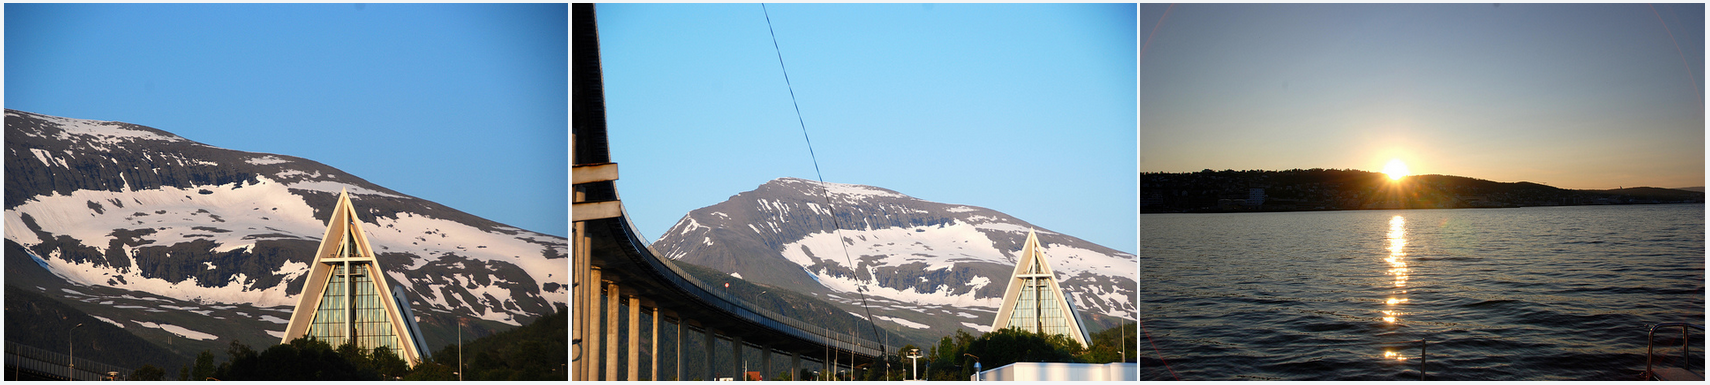 #Midnightsun sailing | #Tromso